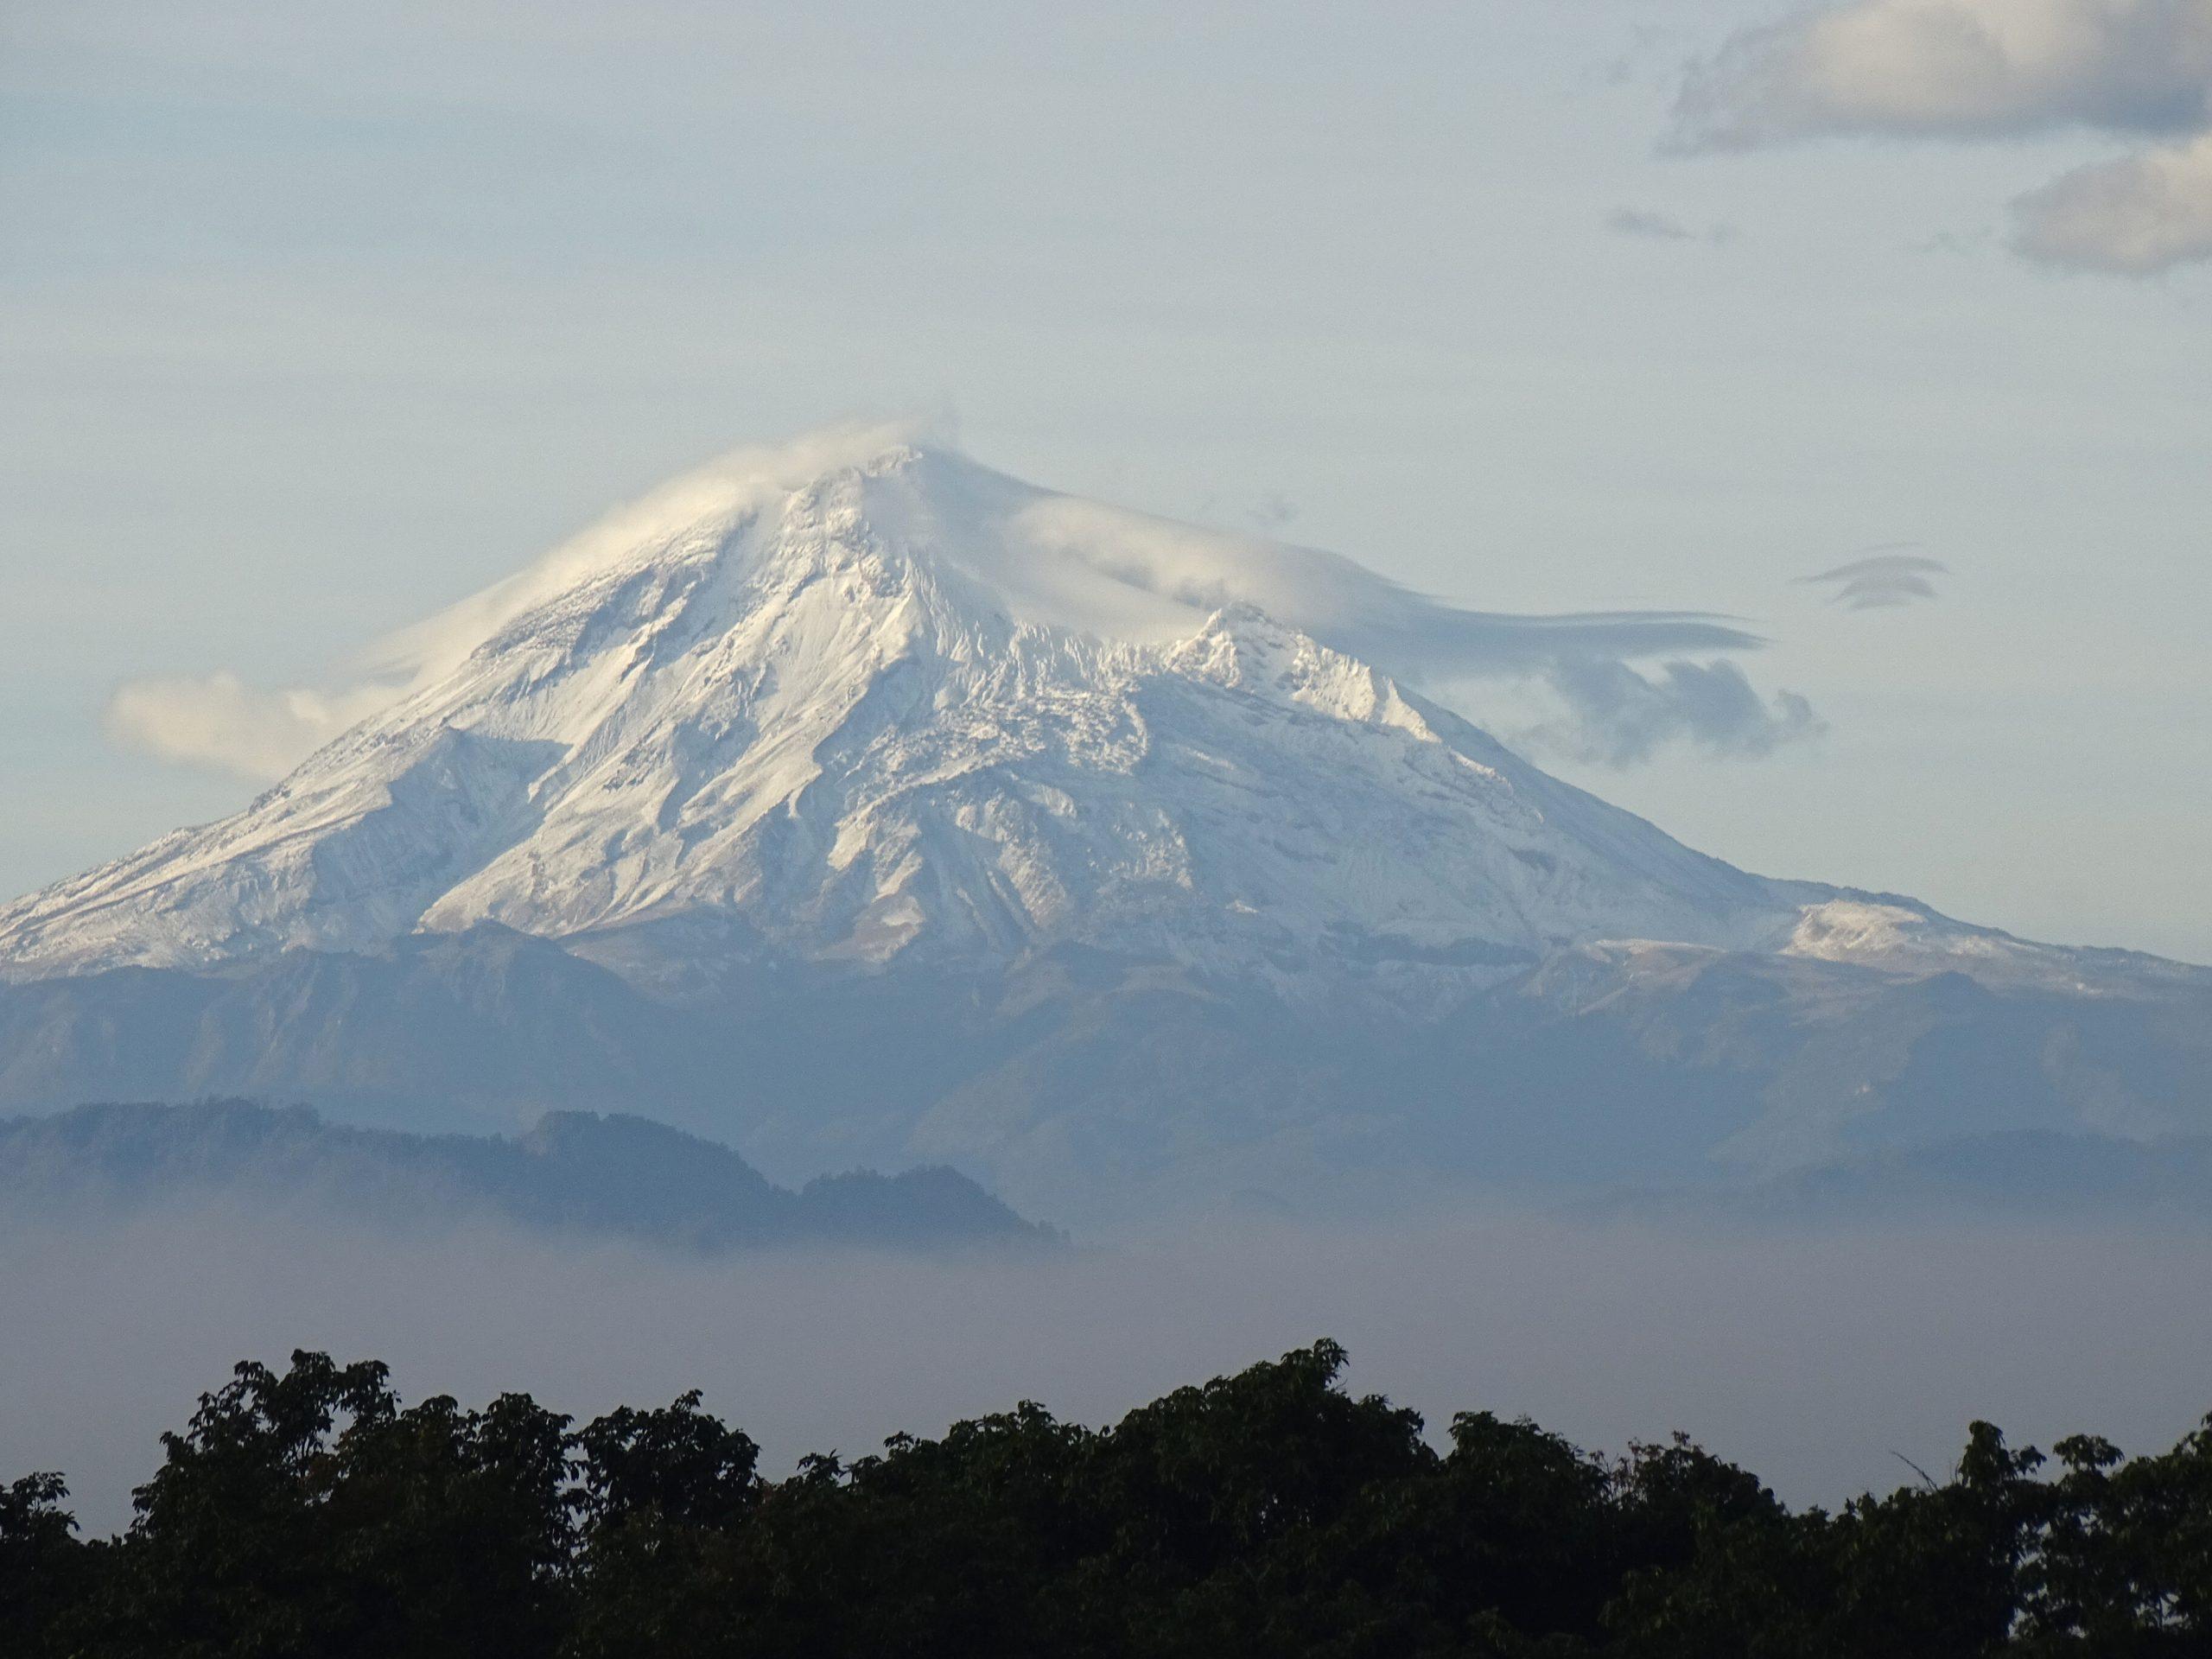 Vista del Citlatépetl desde Xalapa